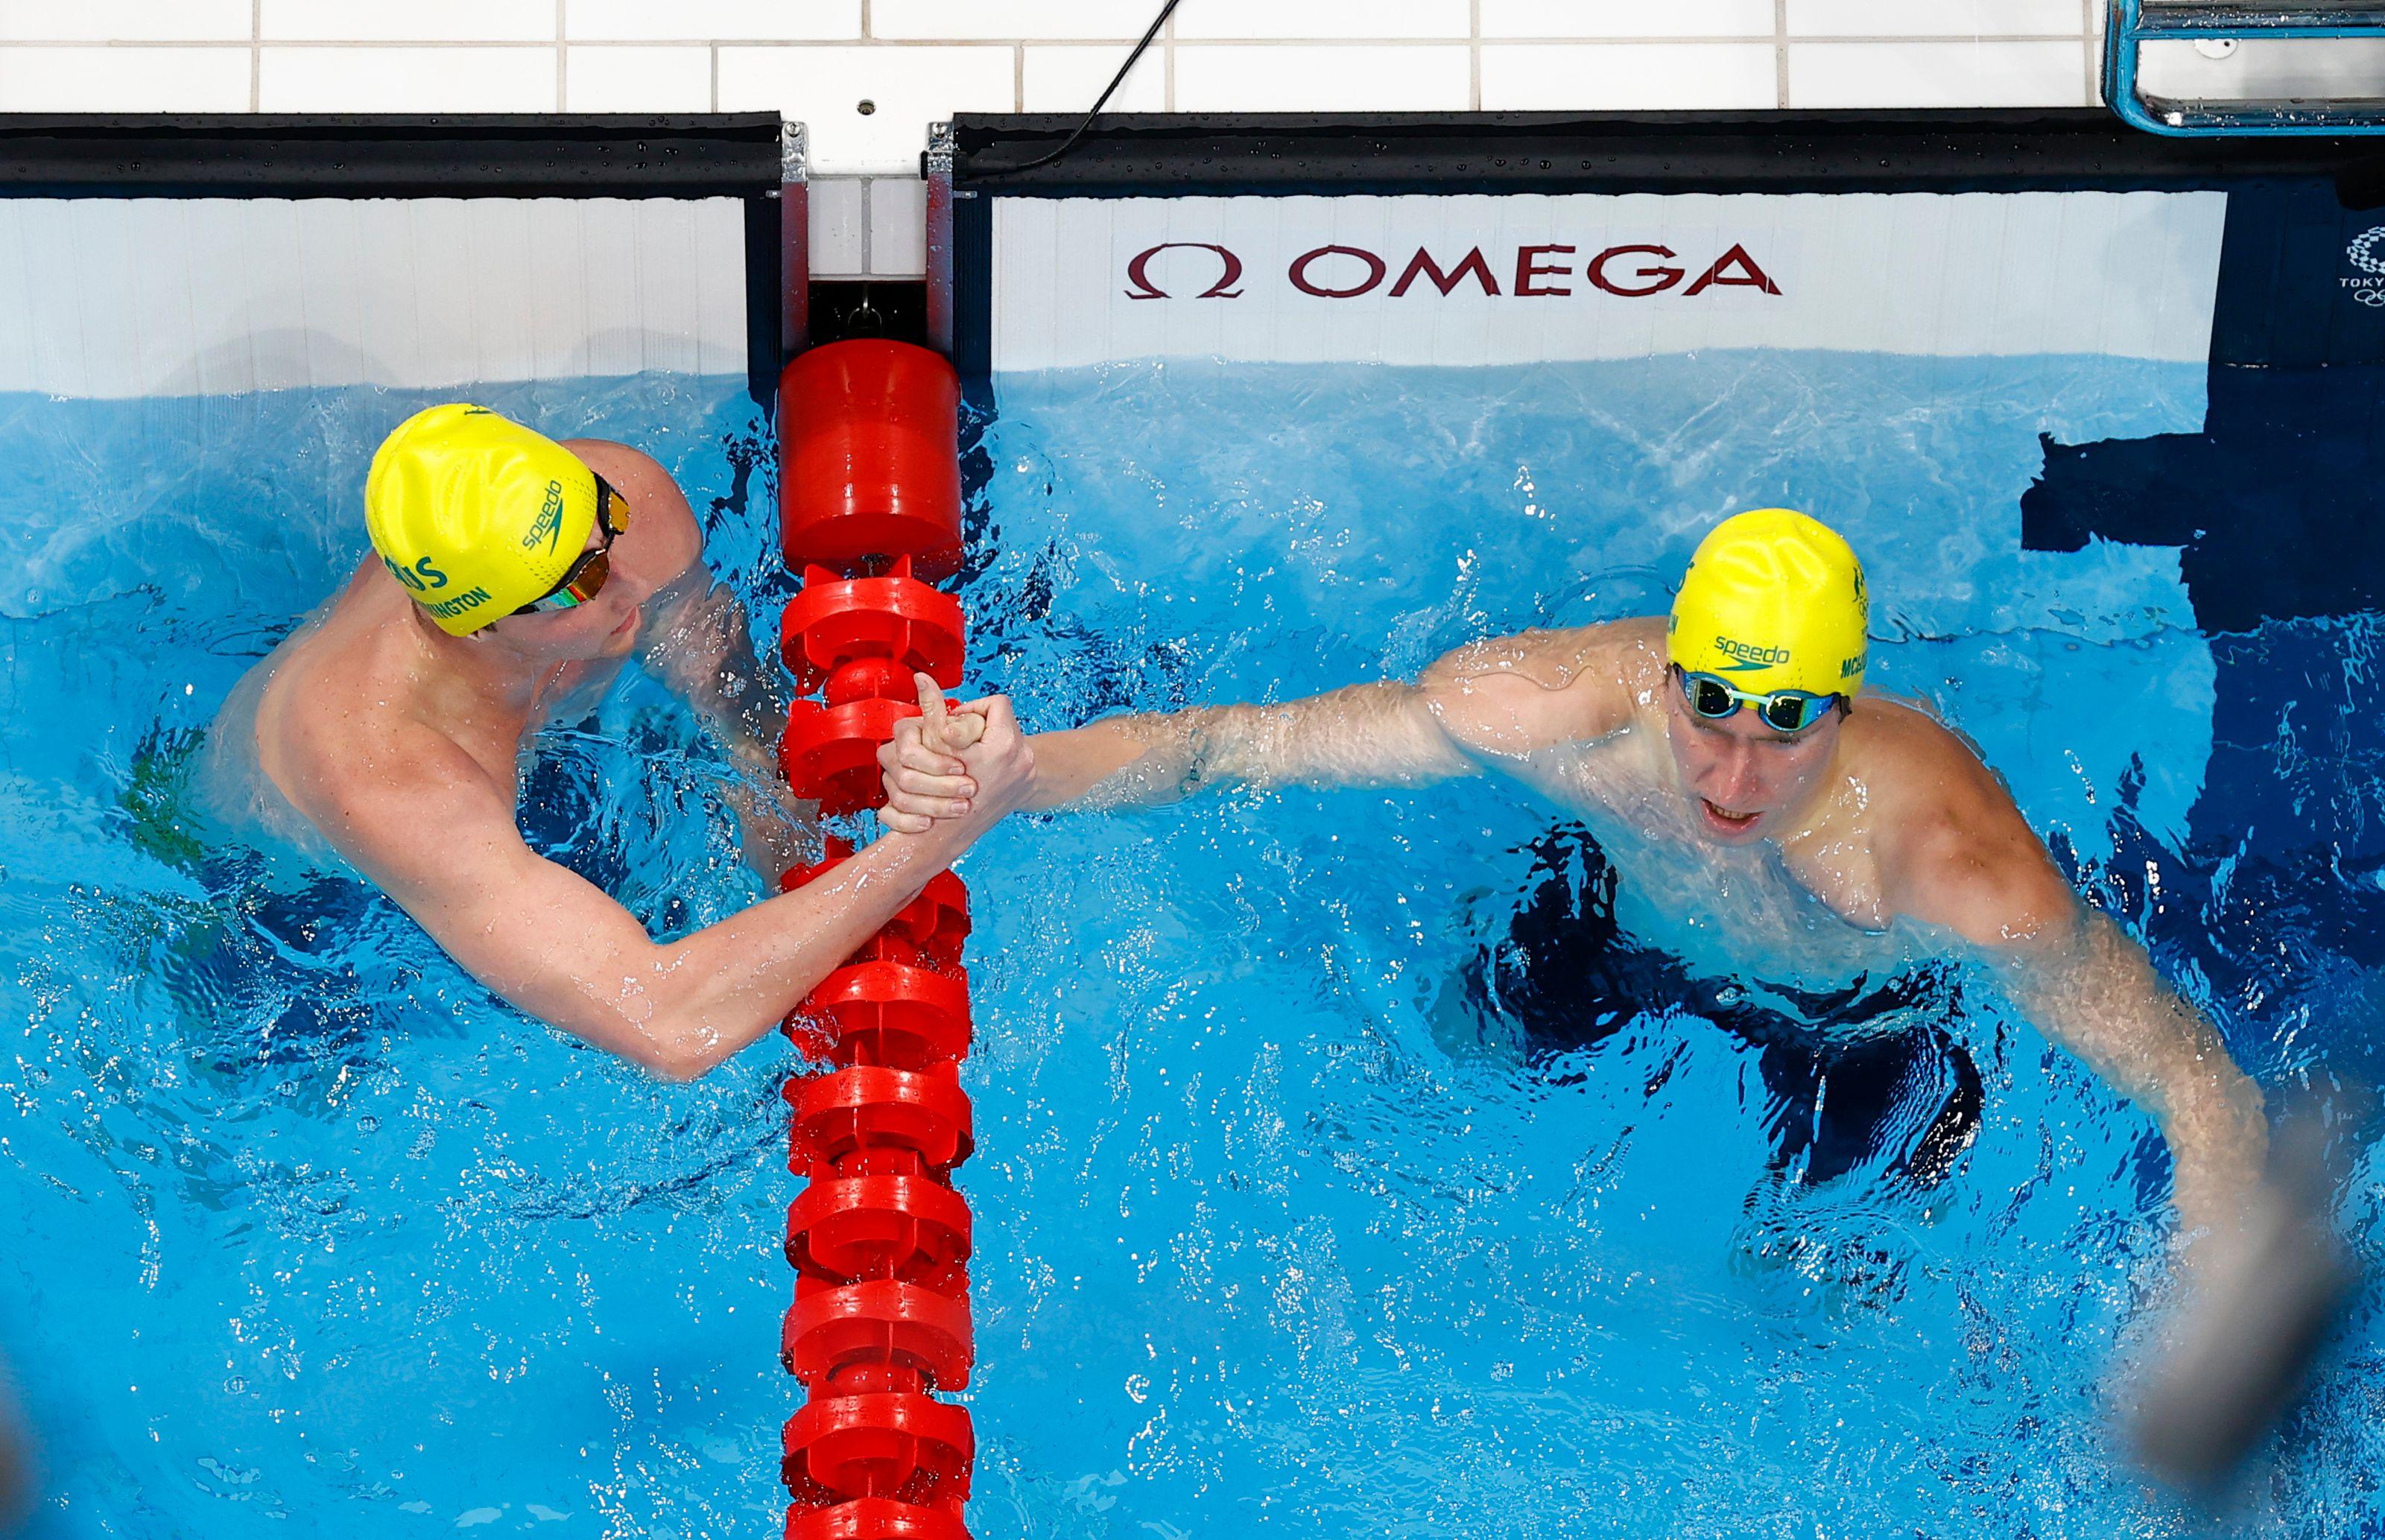 Tokyo 2020 Olympics - Swimming - Men's 400m Freestyle - Heats - Tokyo Aquatics Centre - Tokyo, Japan - July 24, 2021. Elijah Winnington of Australia and Jack McLoughlin of Australia react REUTERS/Antonio Bronic